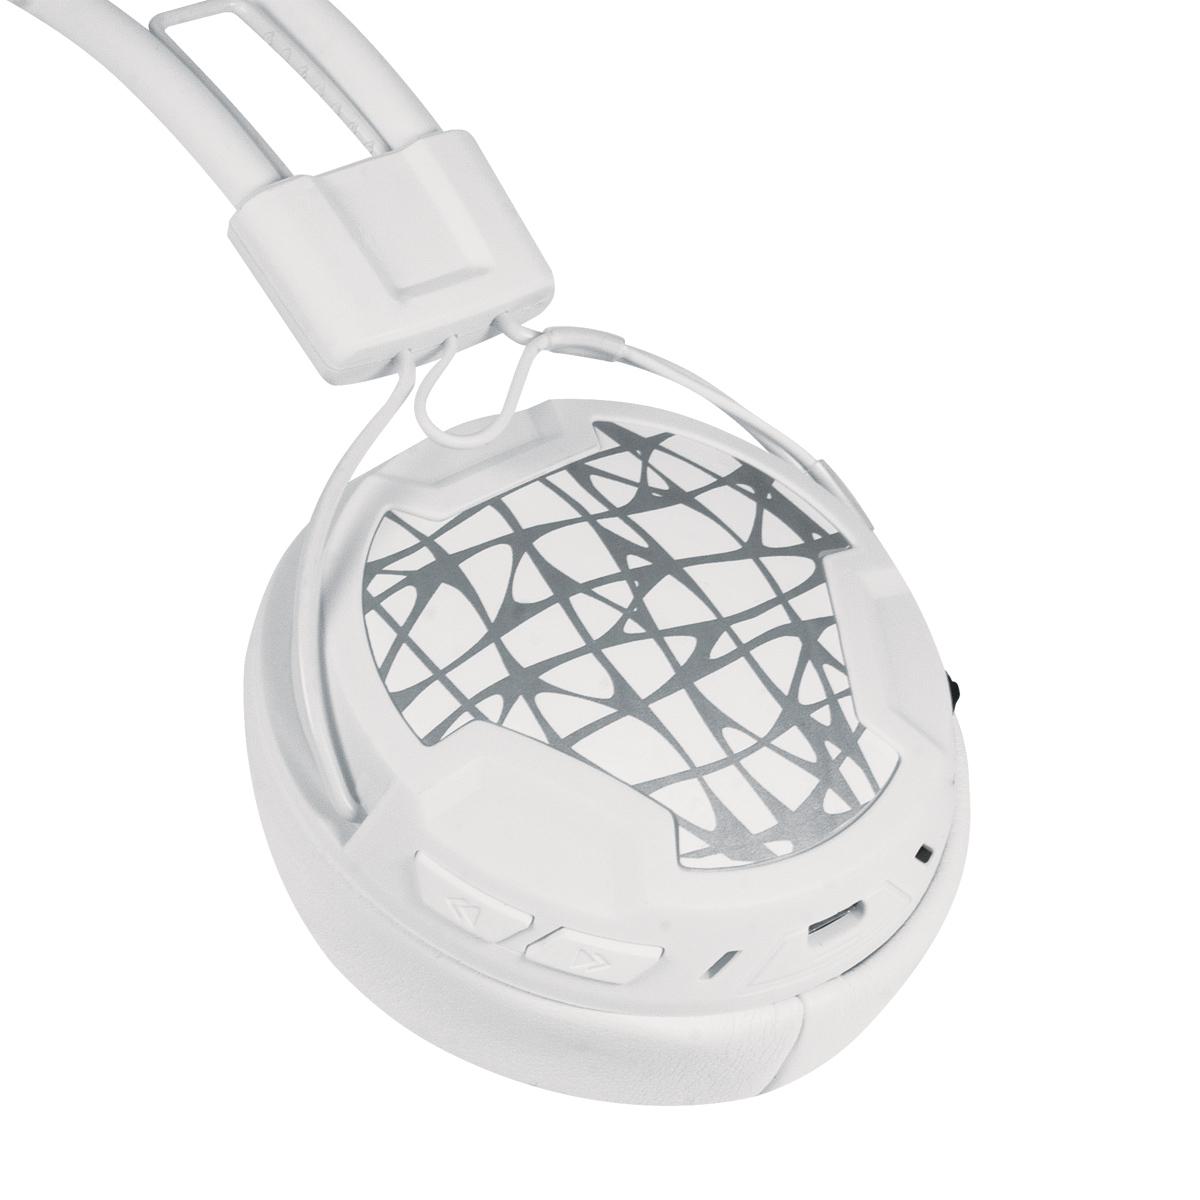 P604 Wireless